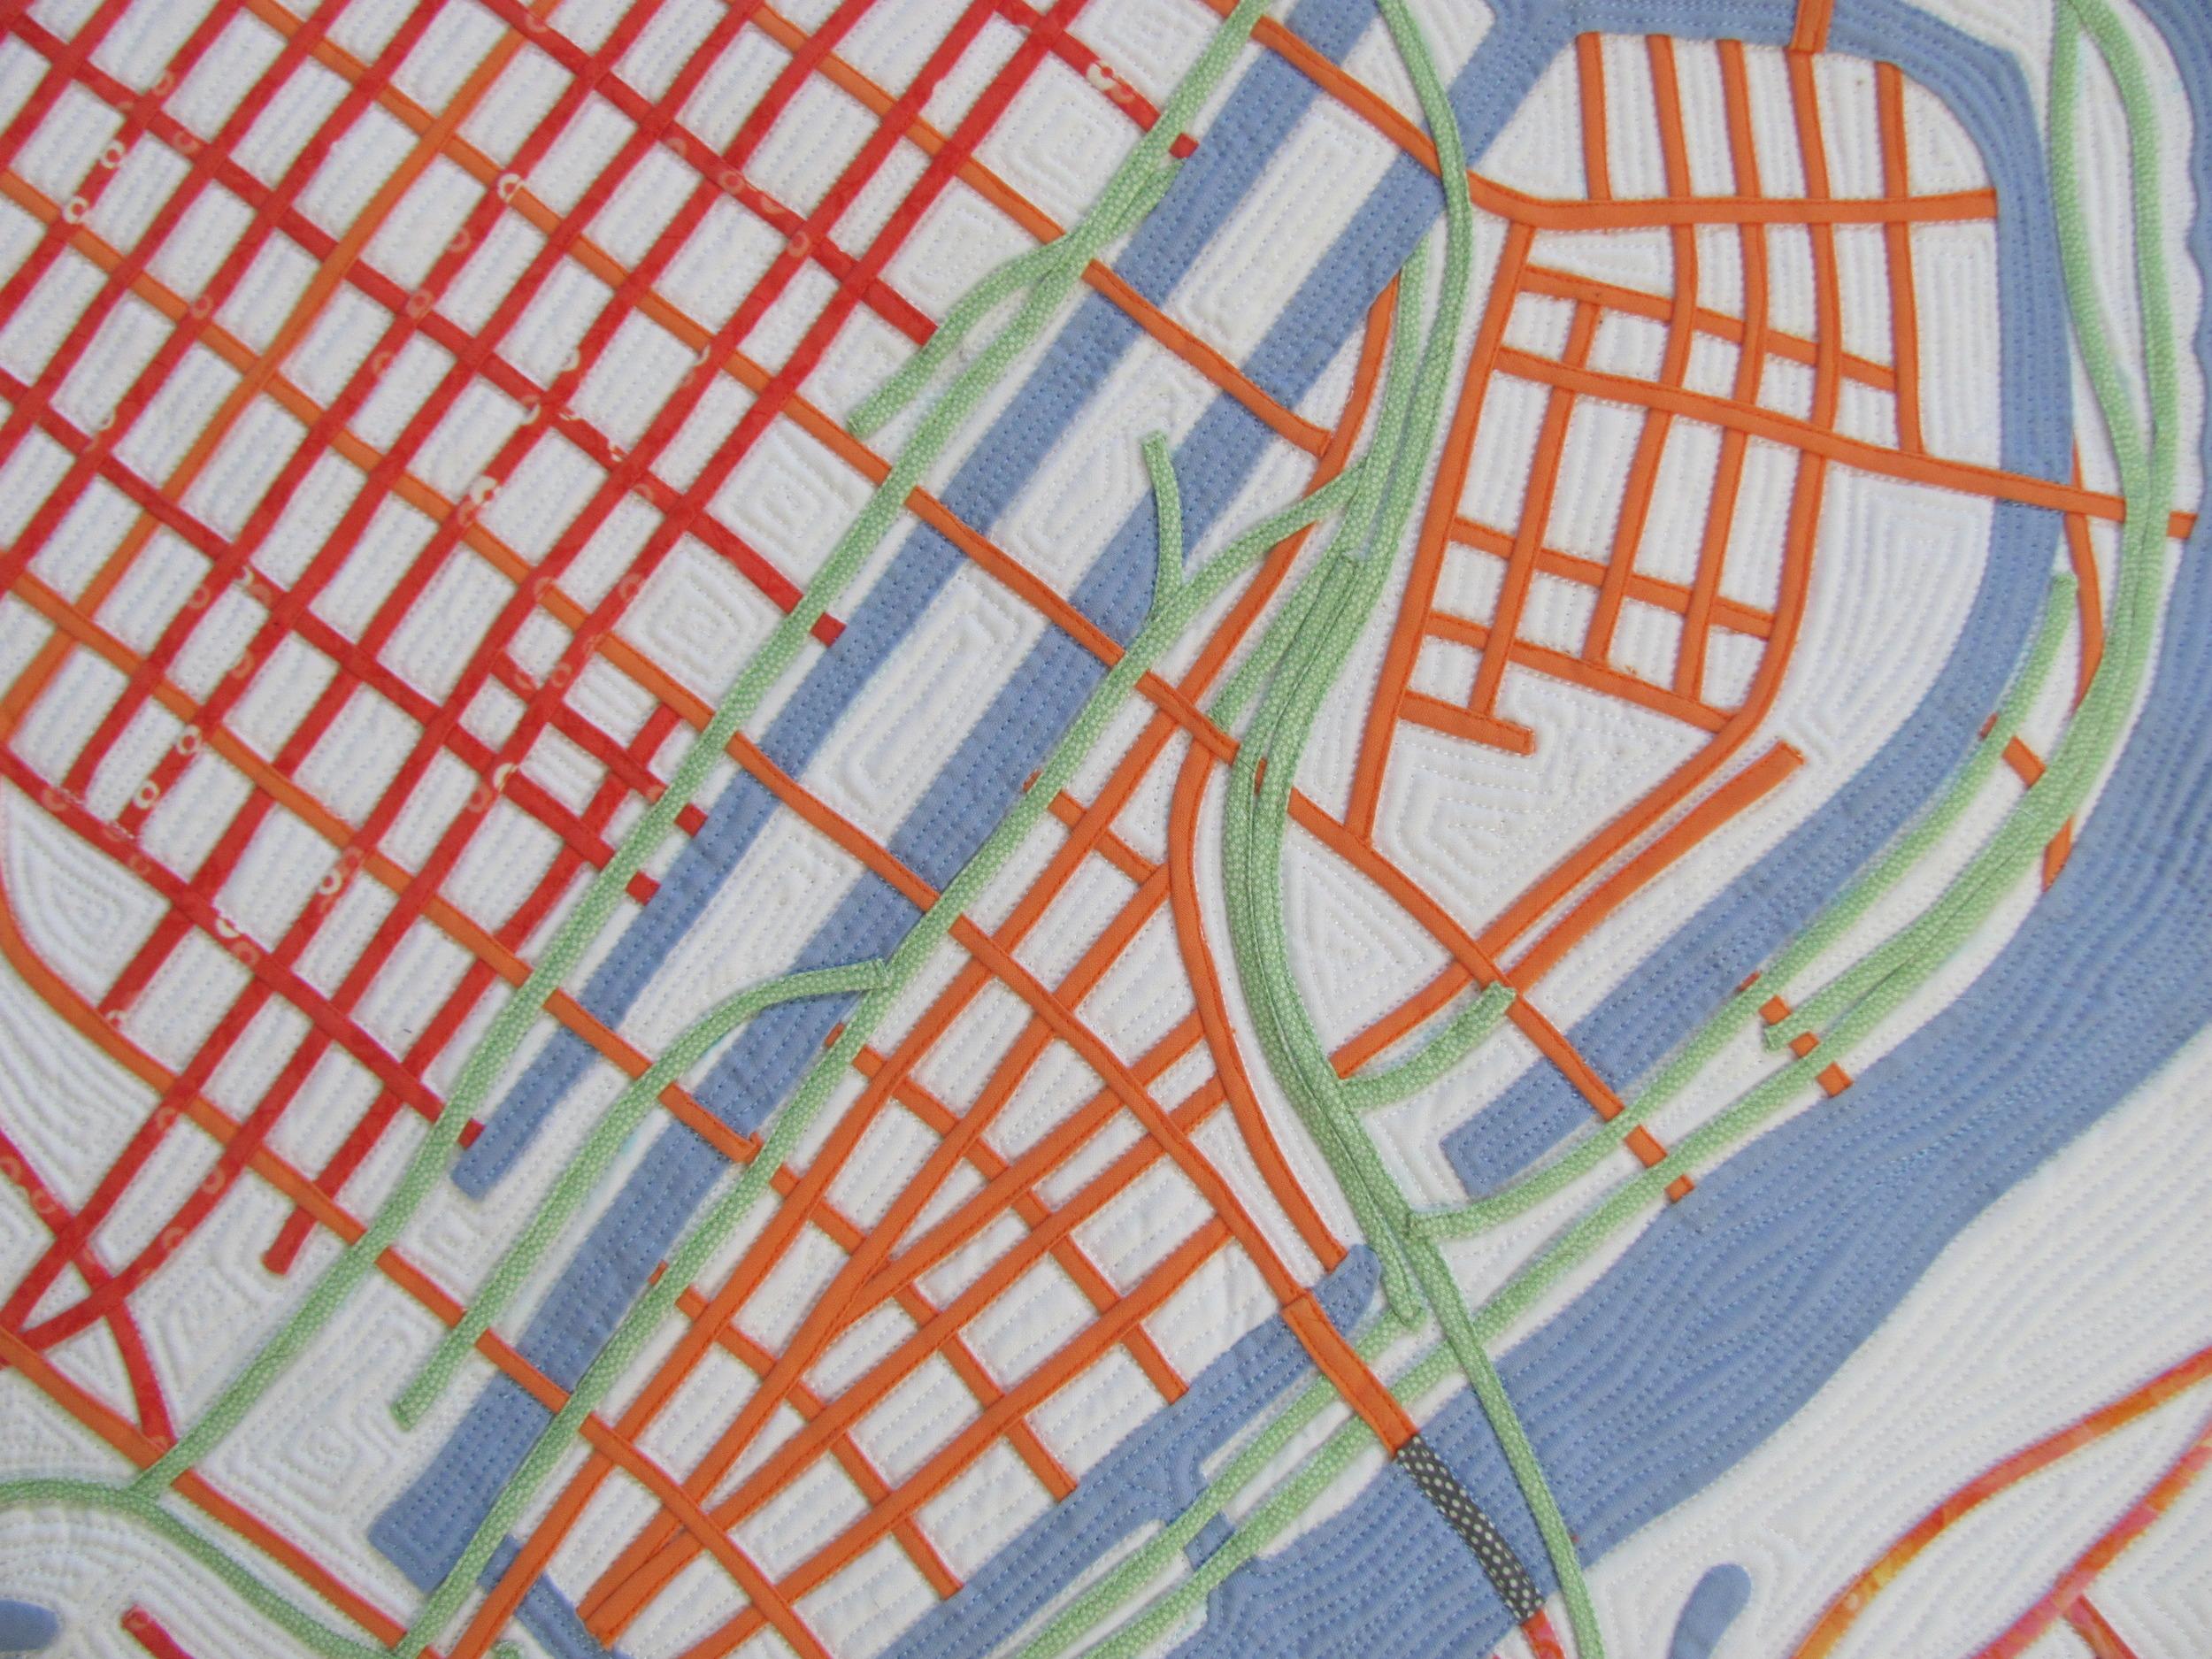 Orange=Streets, Green=Railroad Tracks